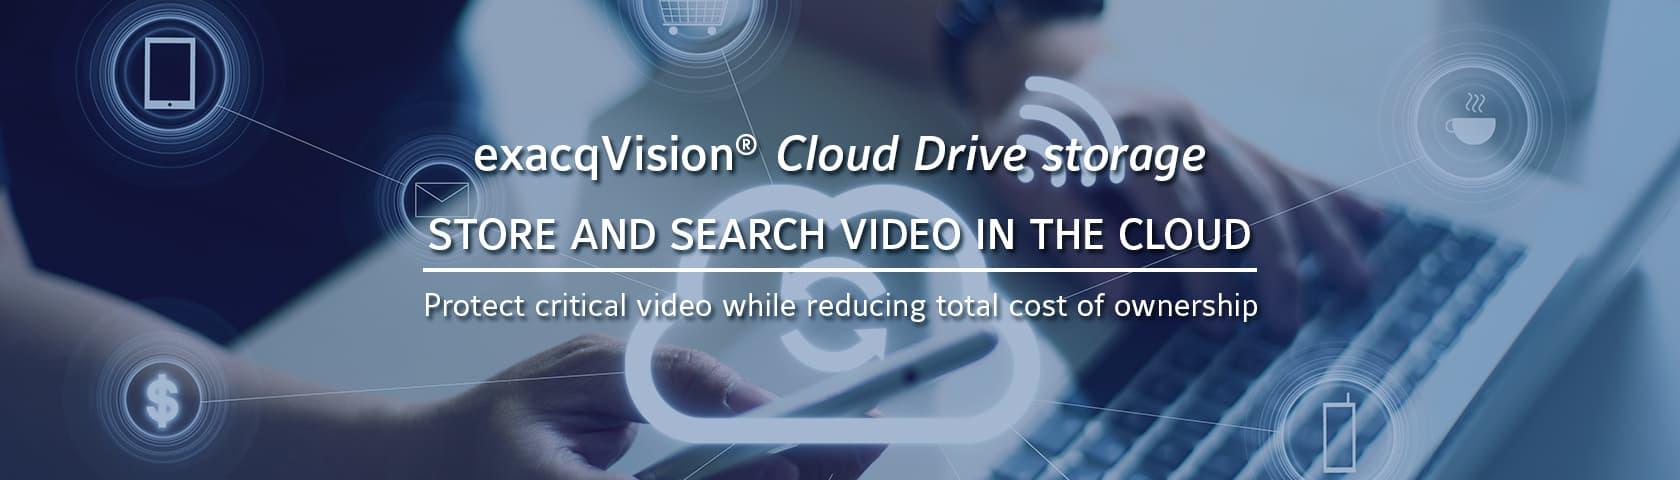 exacqVision Cloud Drive